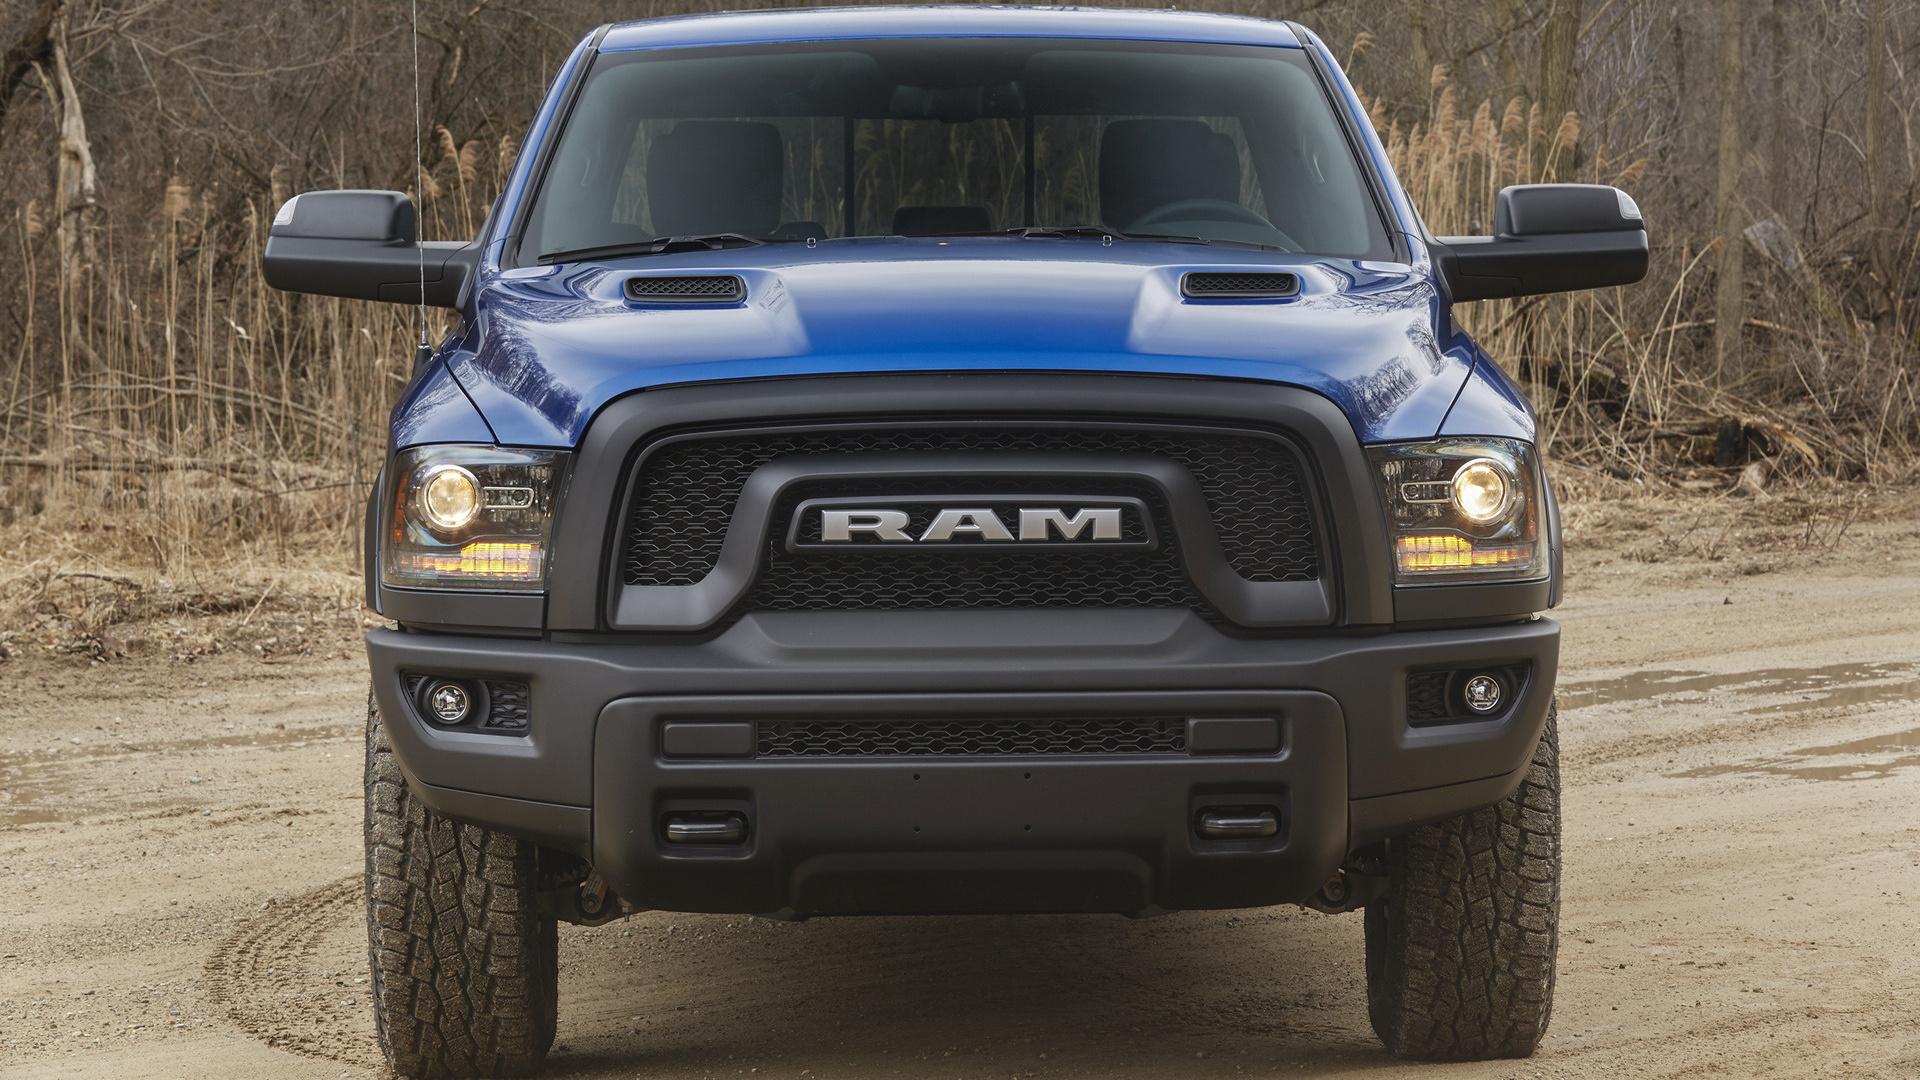 2017 Ram 1500 Rebel Blue Streak Crew Cab Wallpapers And Hd